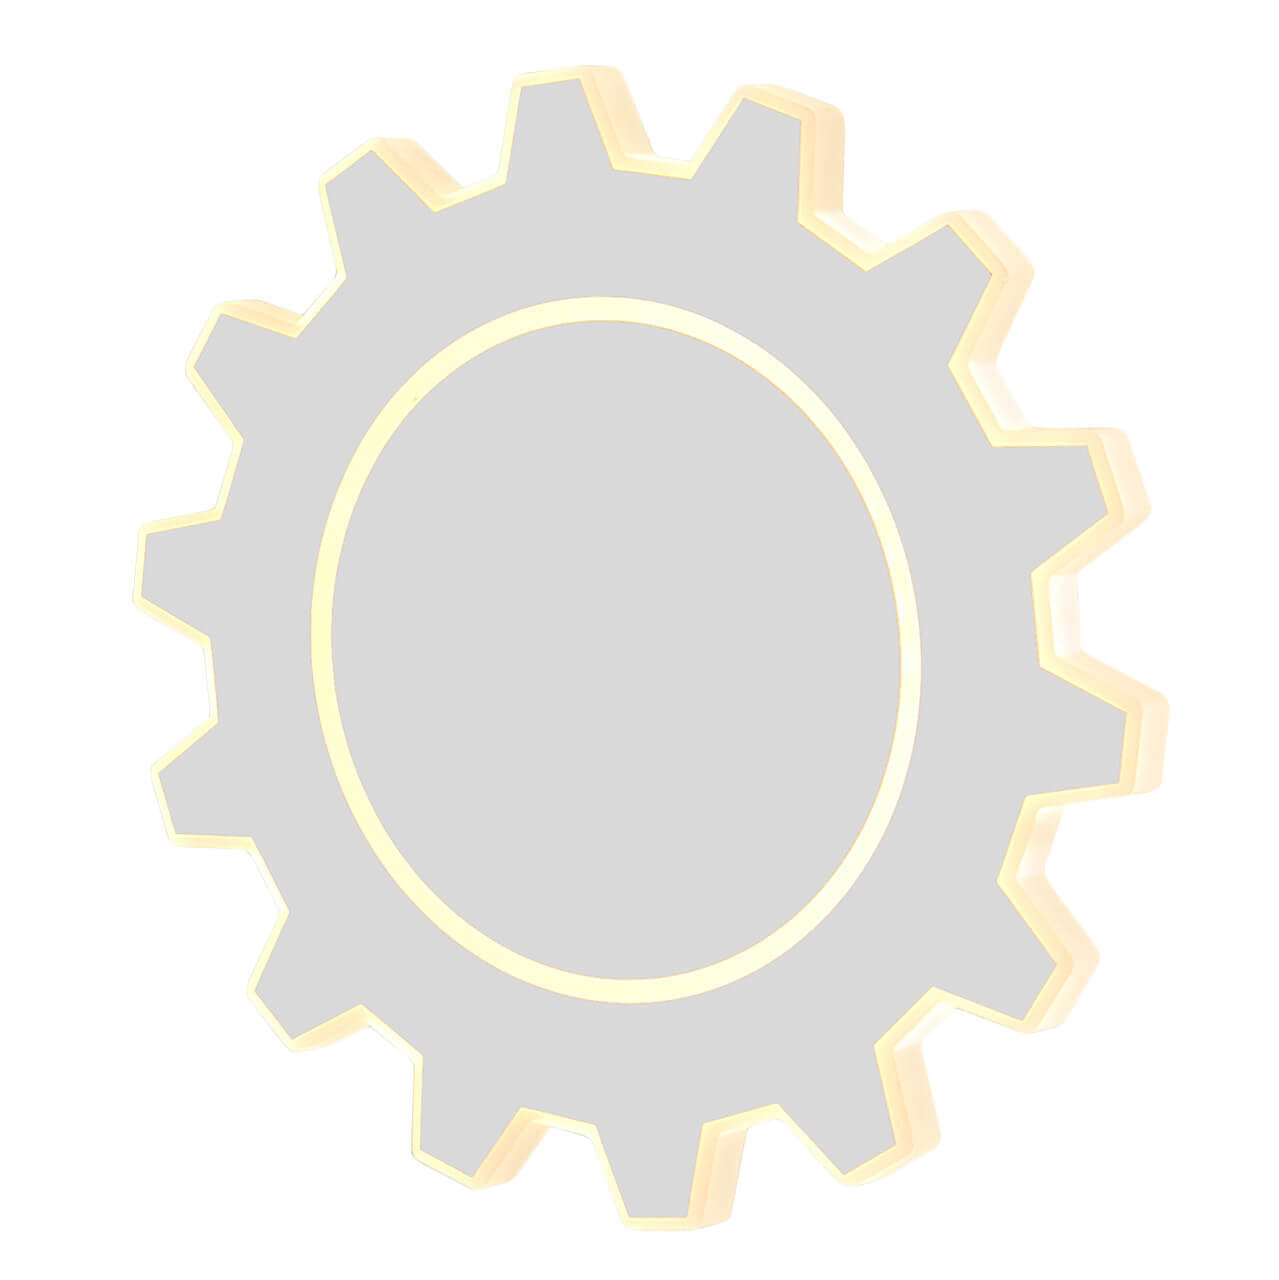 Светильник Elektrostandard 4690389125379 Gear